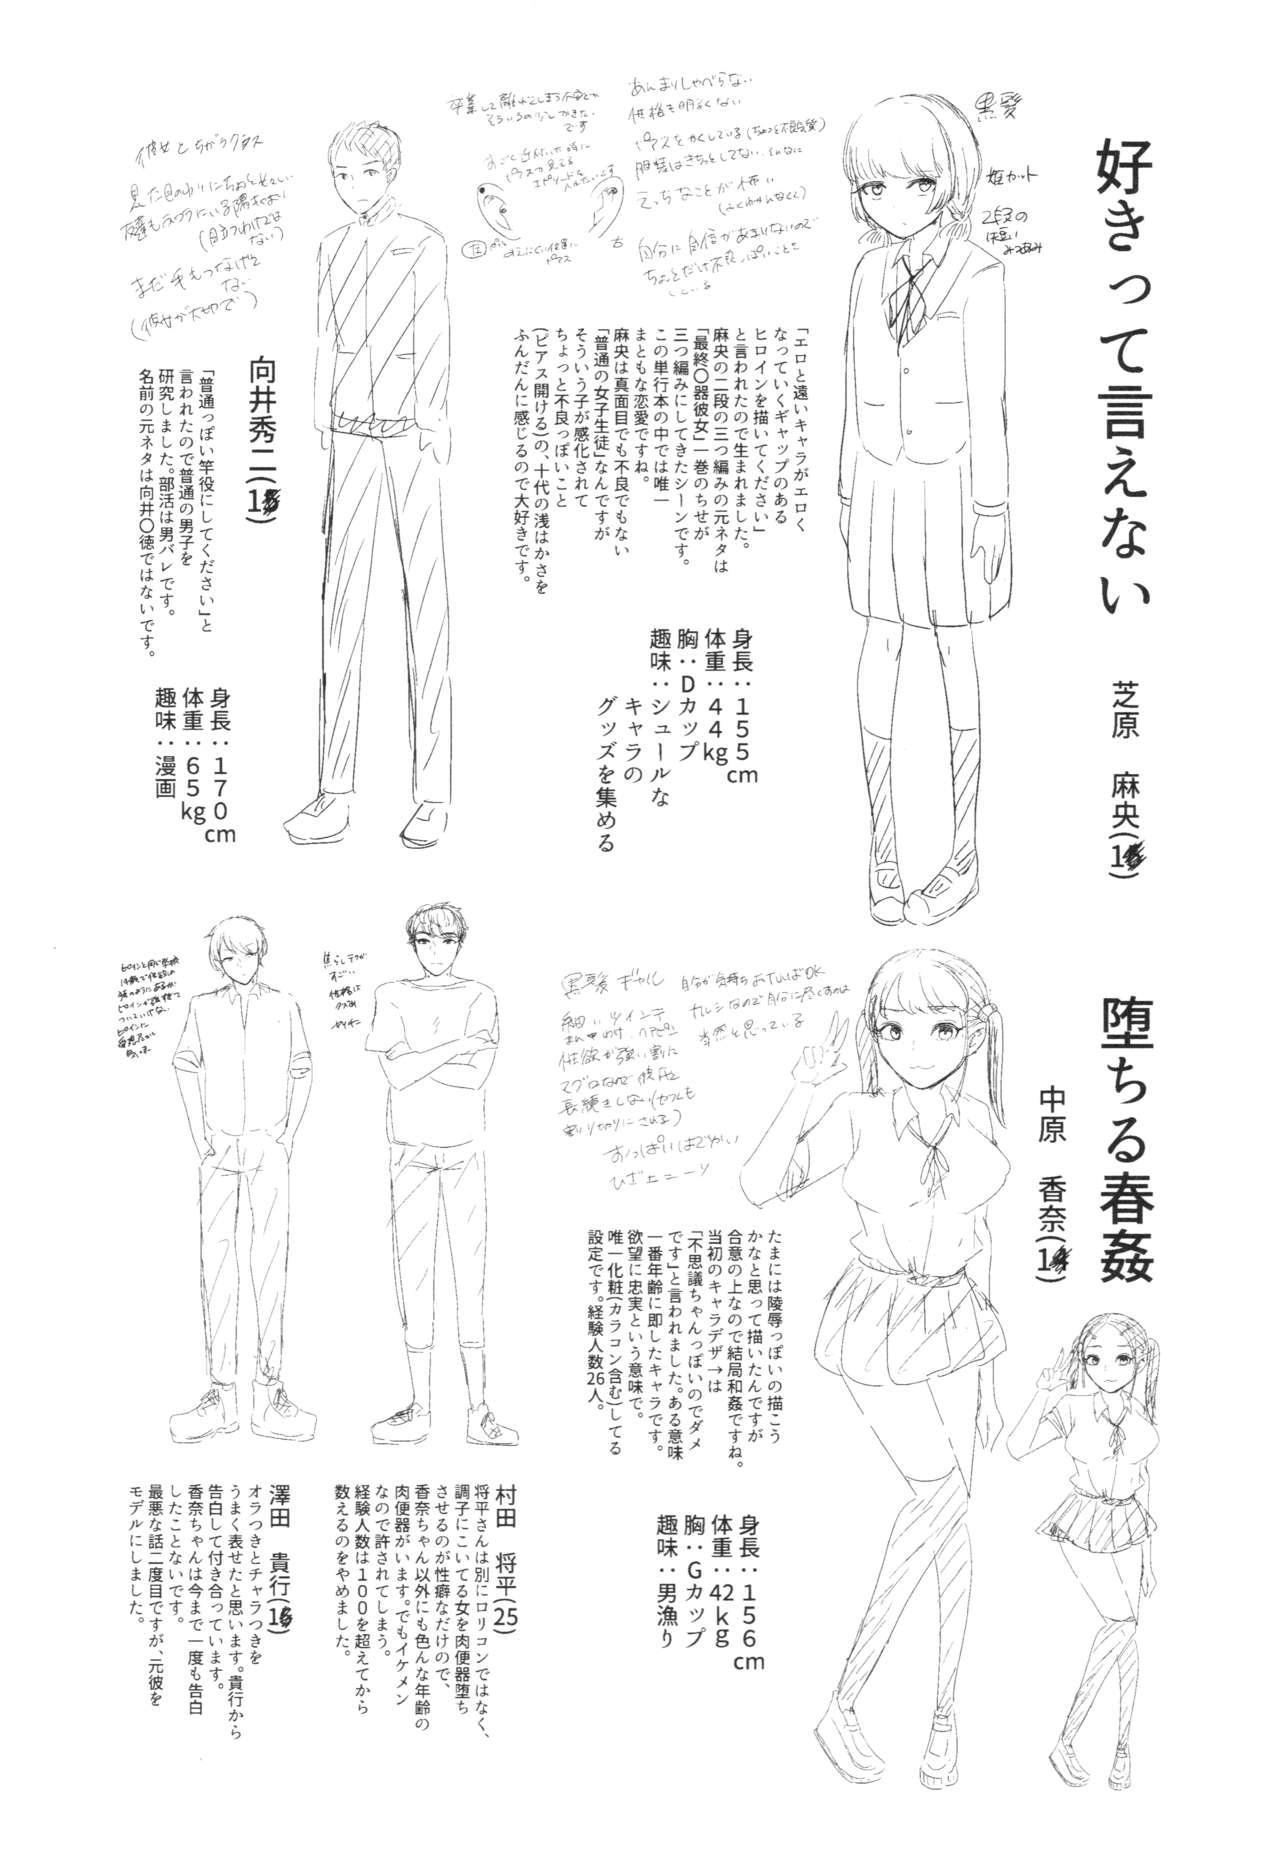 Sannenkan no Aoi Haru 210